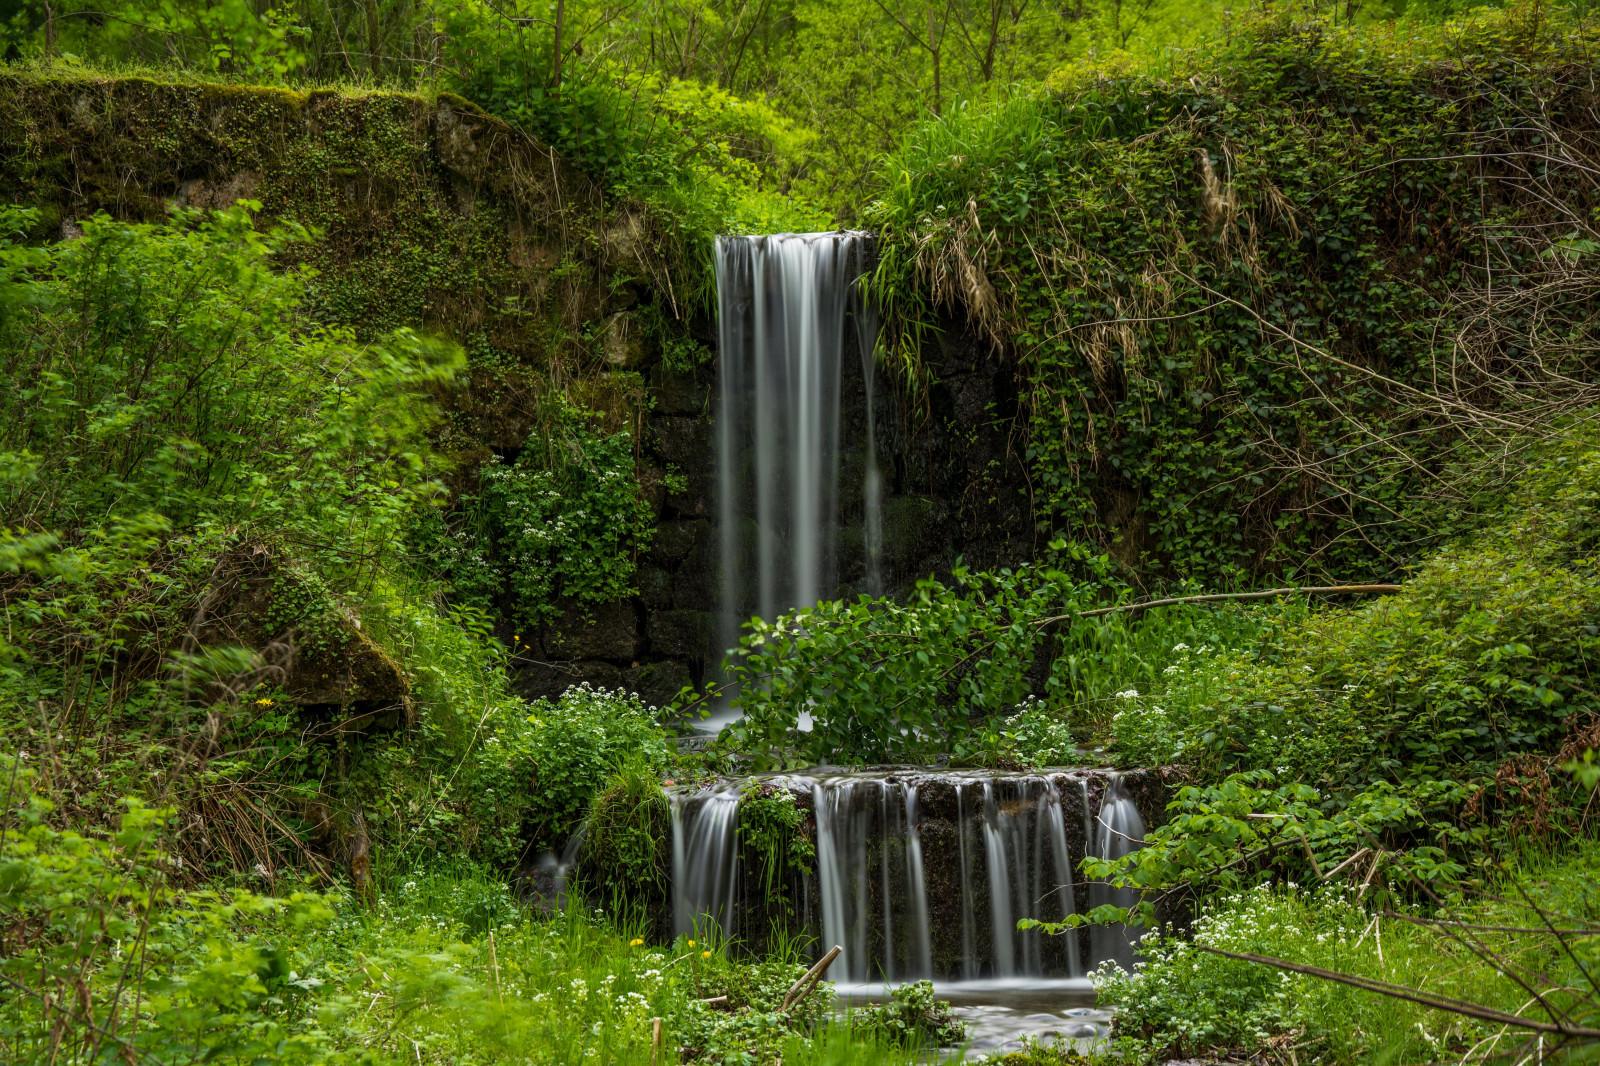 Wallpaper forest waterfall garden nature jungle for Waterfall environment